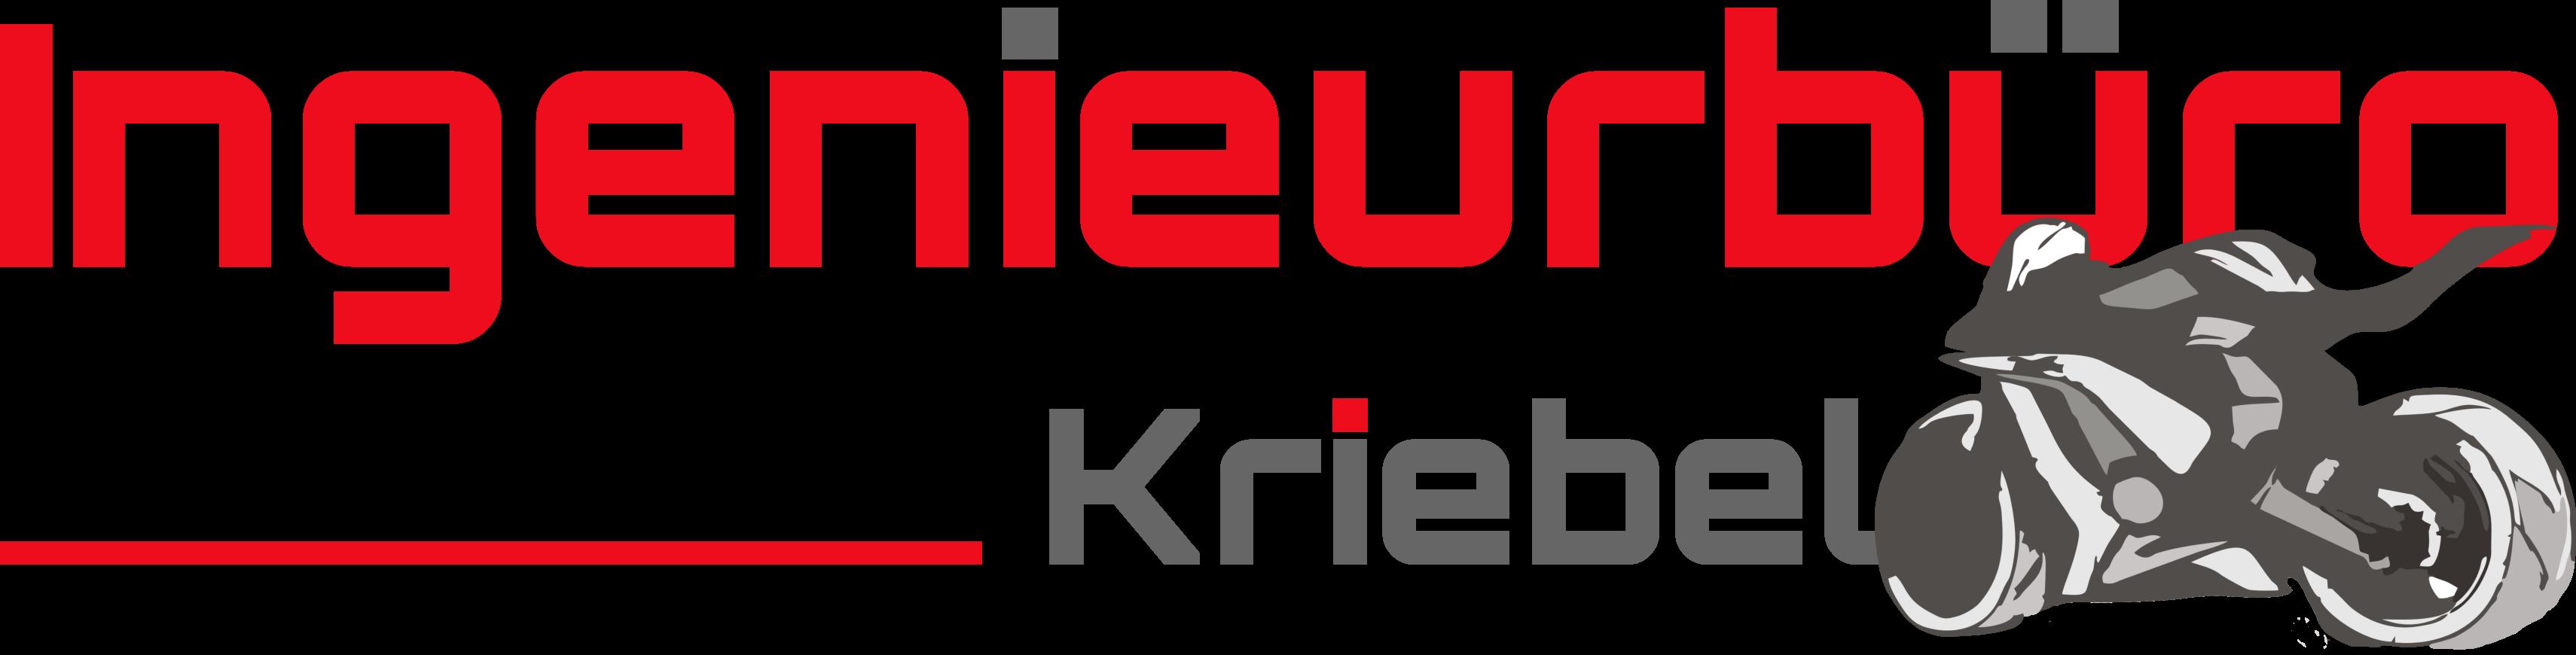 Ingenieurbuero Kriebel